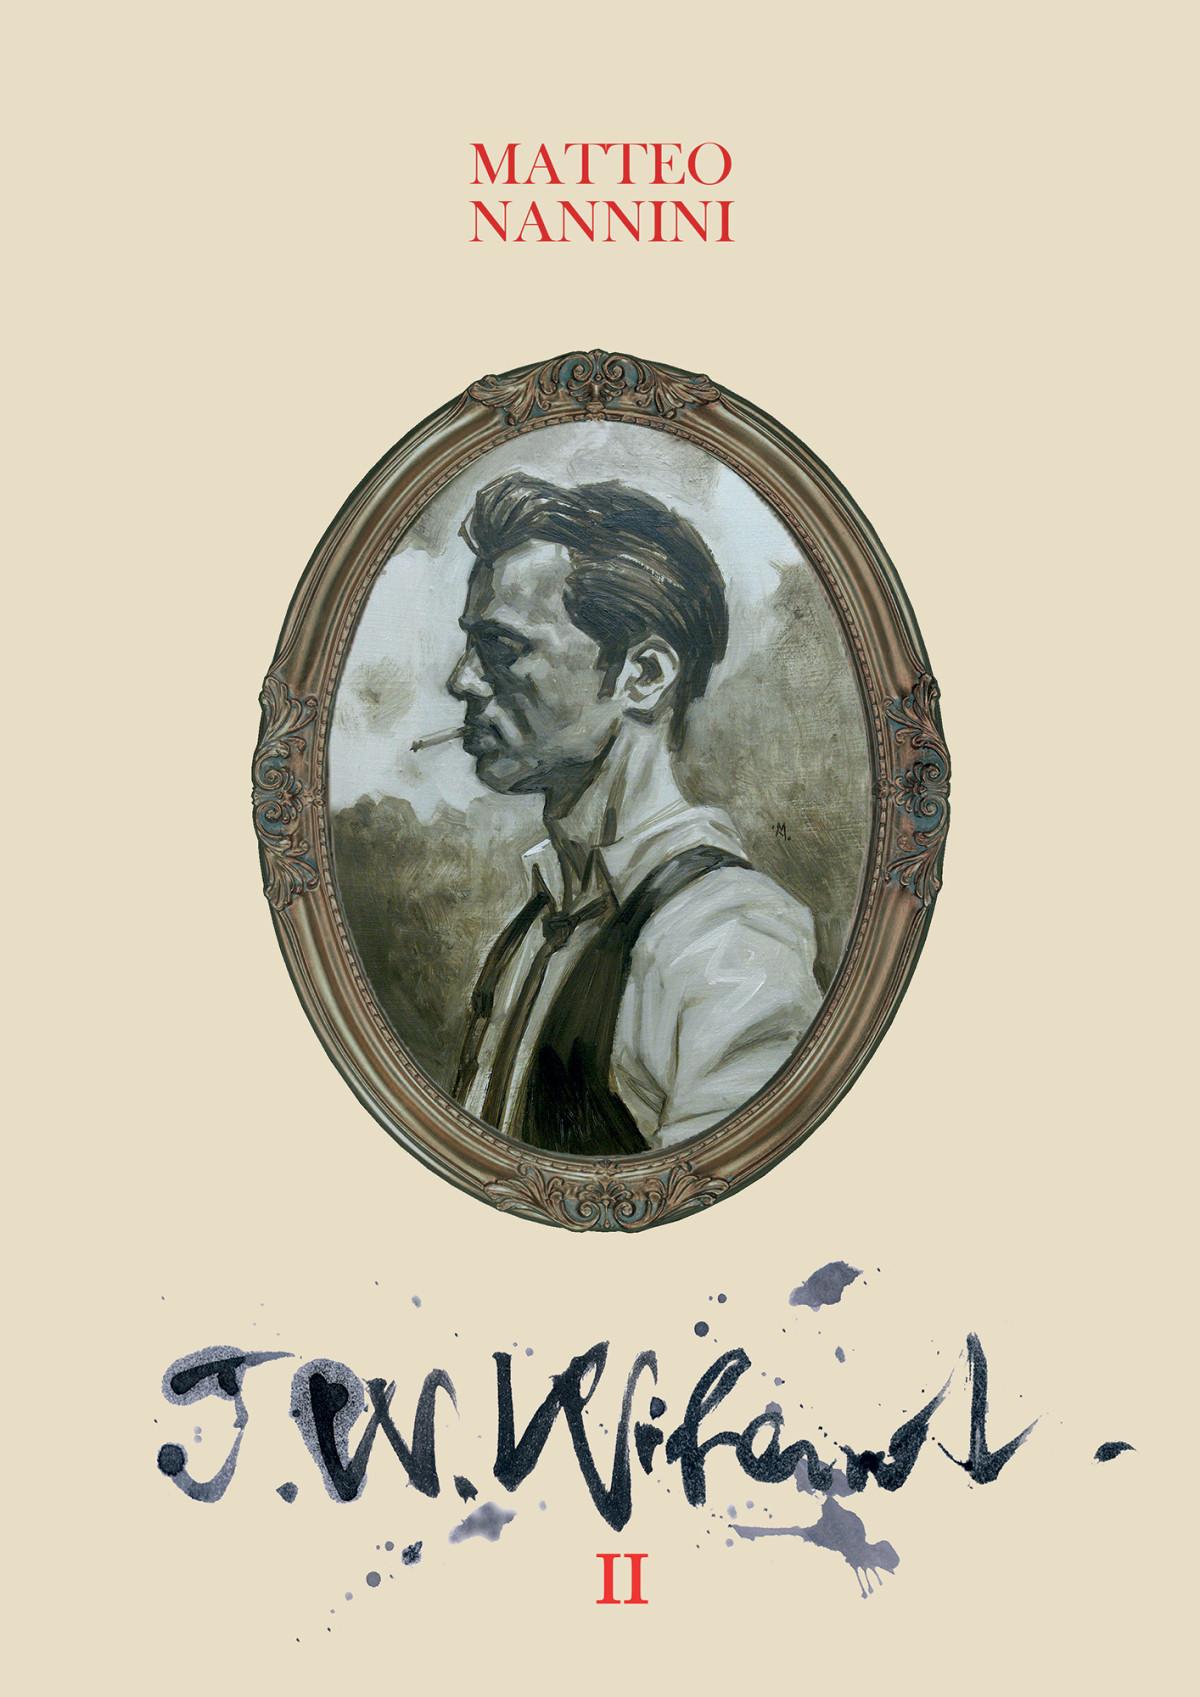 Copertina volume secondo J.W. Wiland